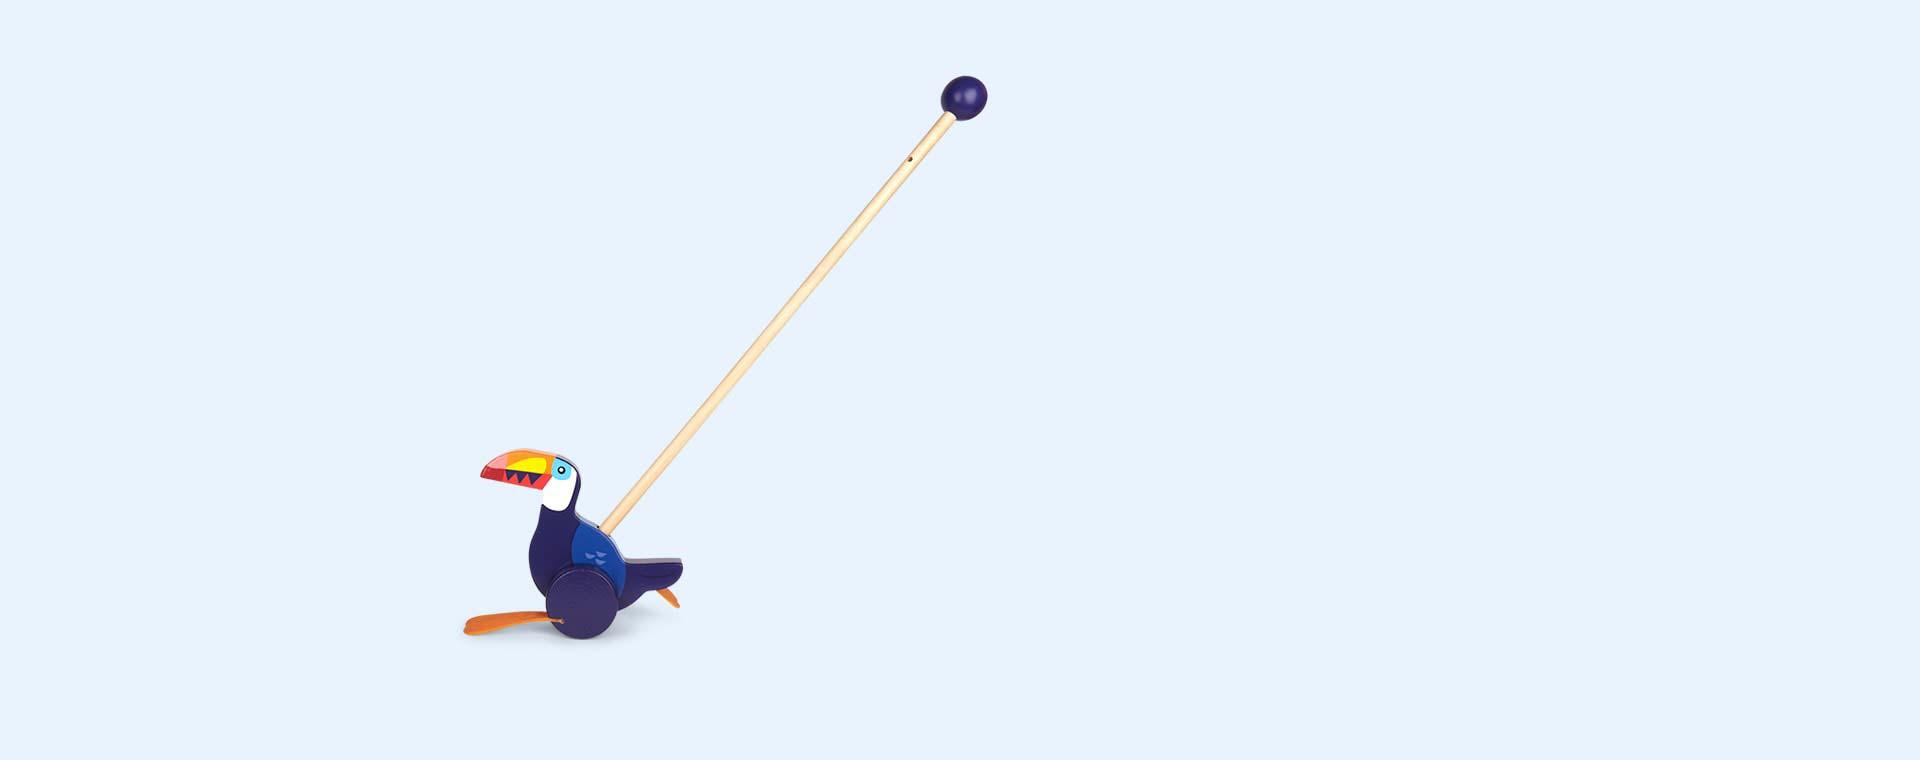 Blue Sunnylife Push Along Toucan